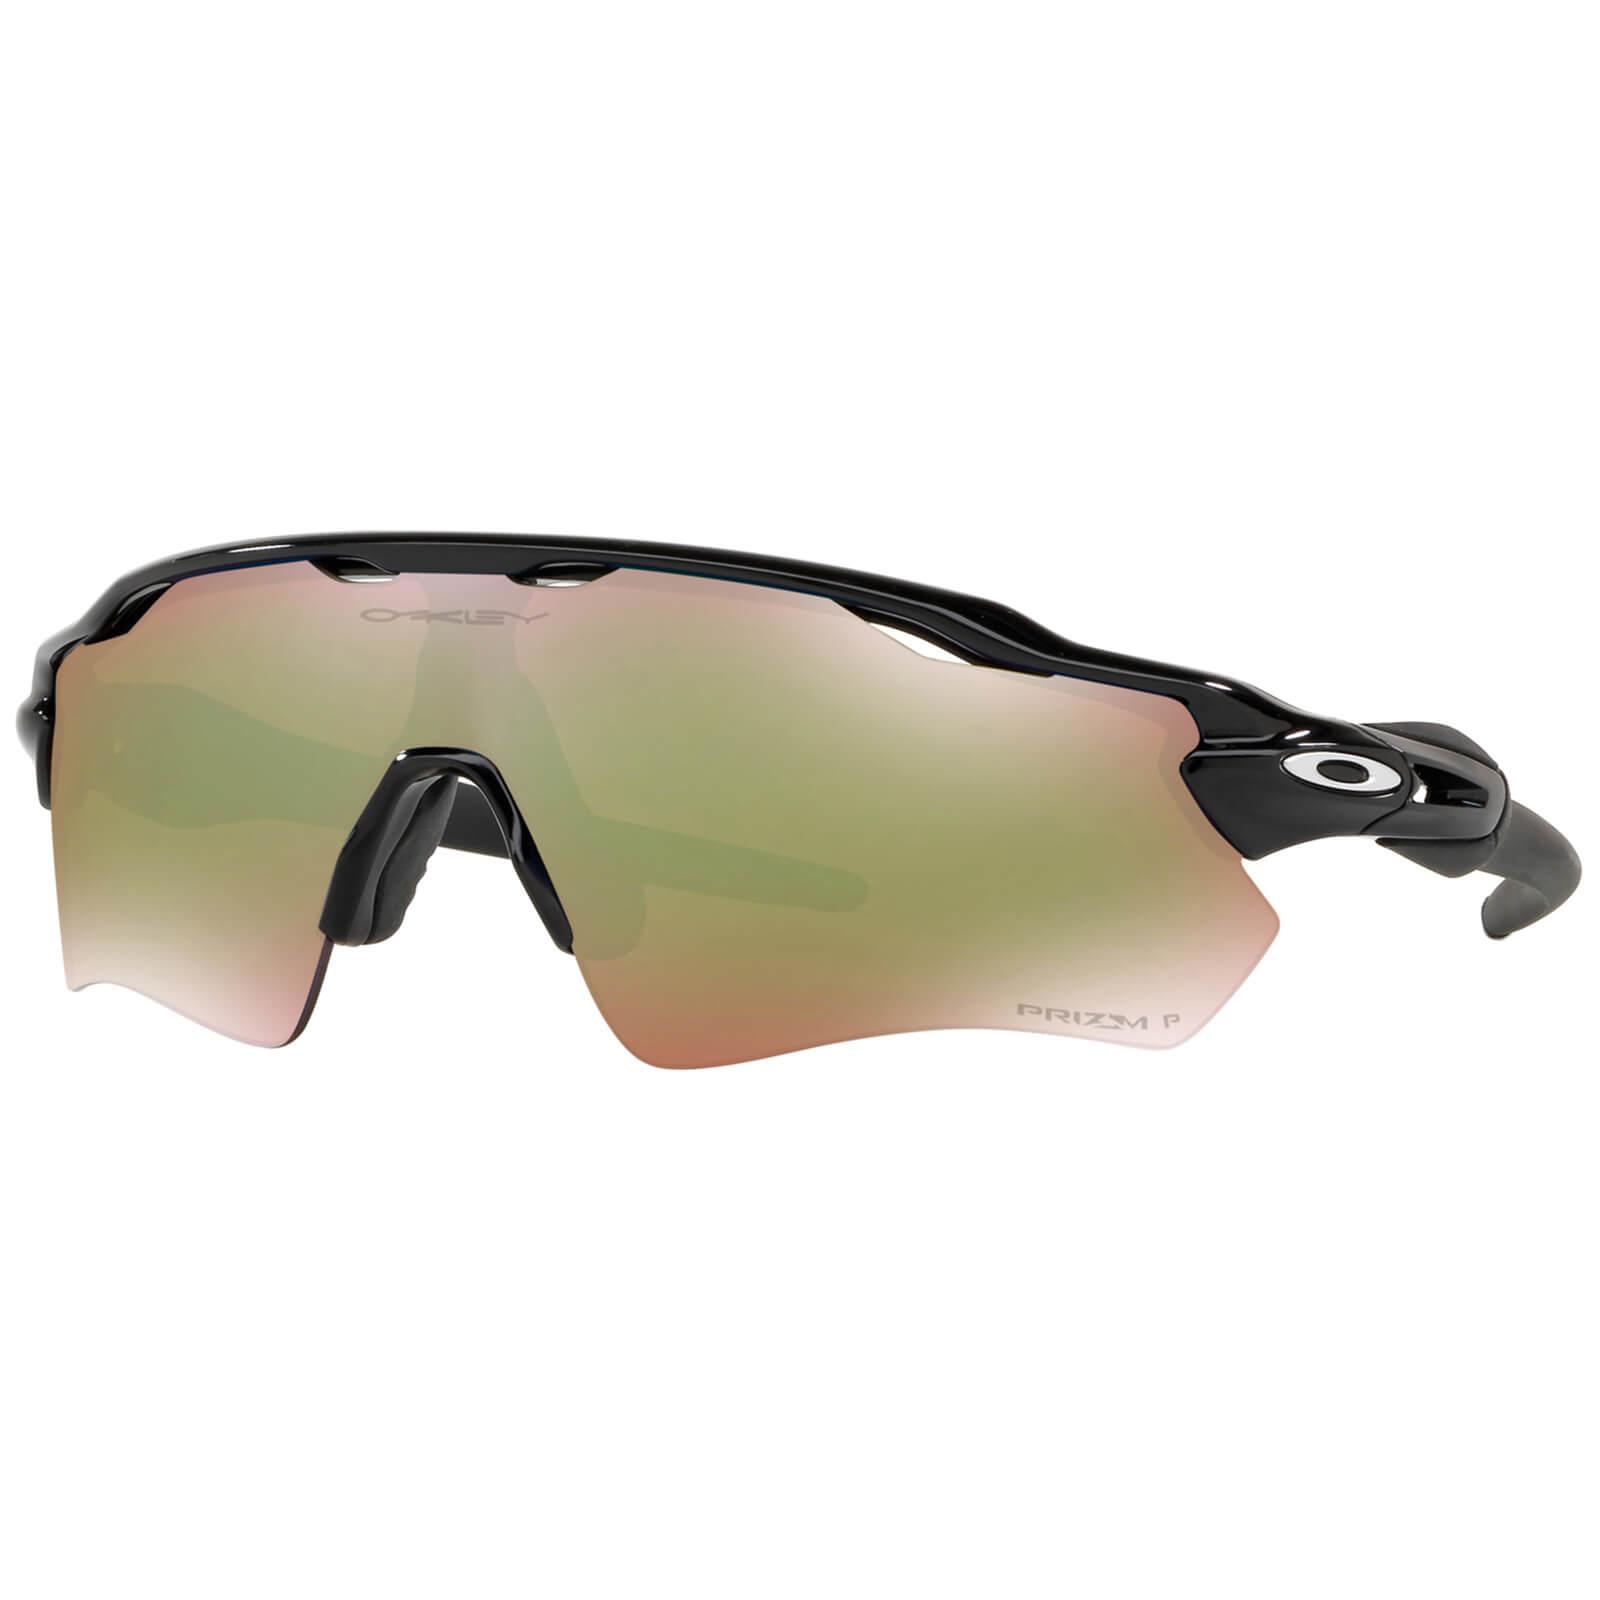 77ef760adbc2a Oakley Radar EV Path Polarized Sunglasses - Polished Black Prizm Shallow  Water